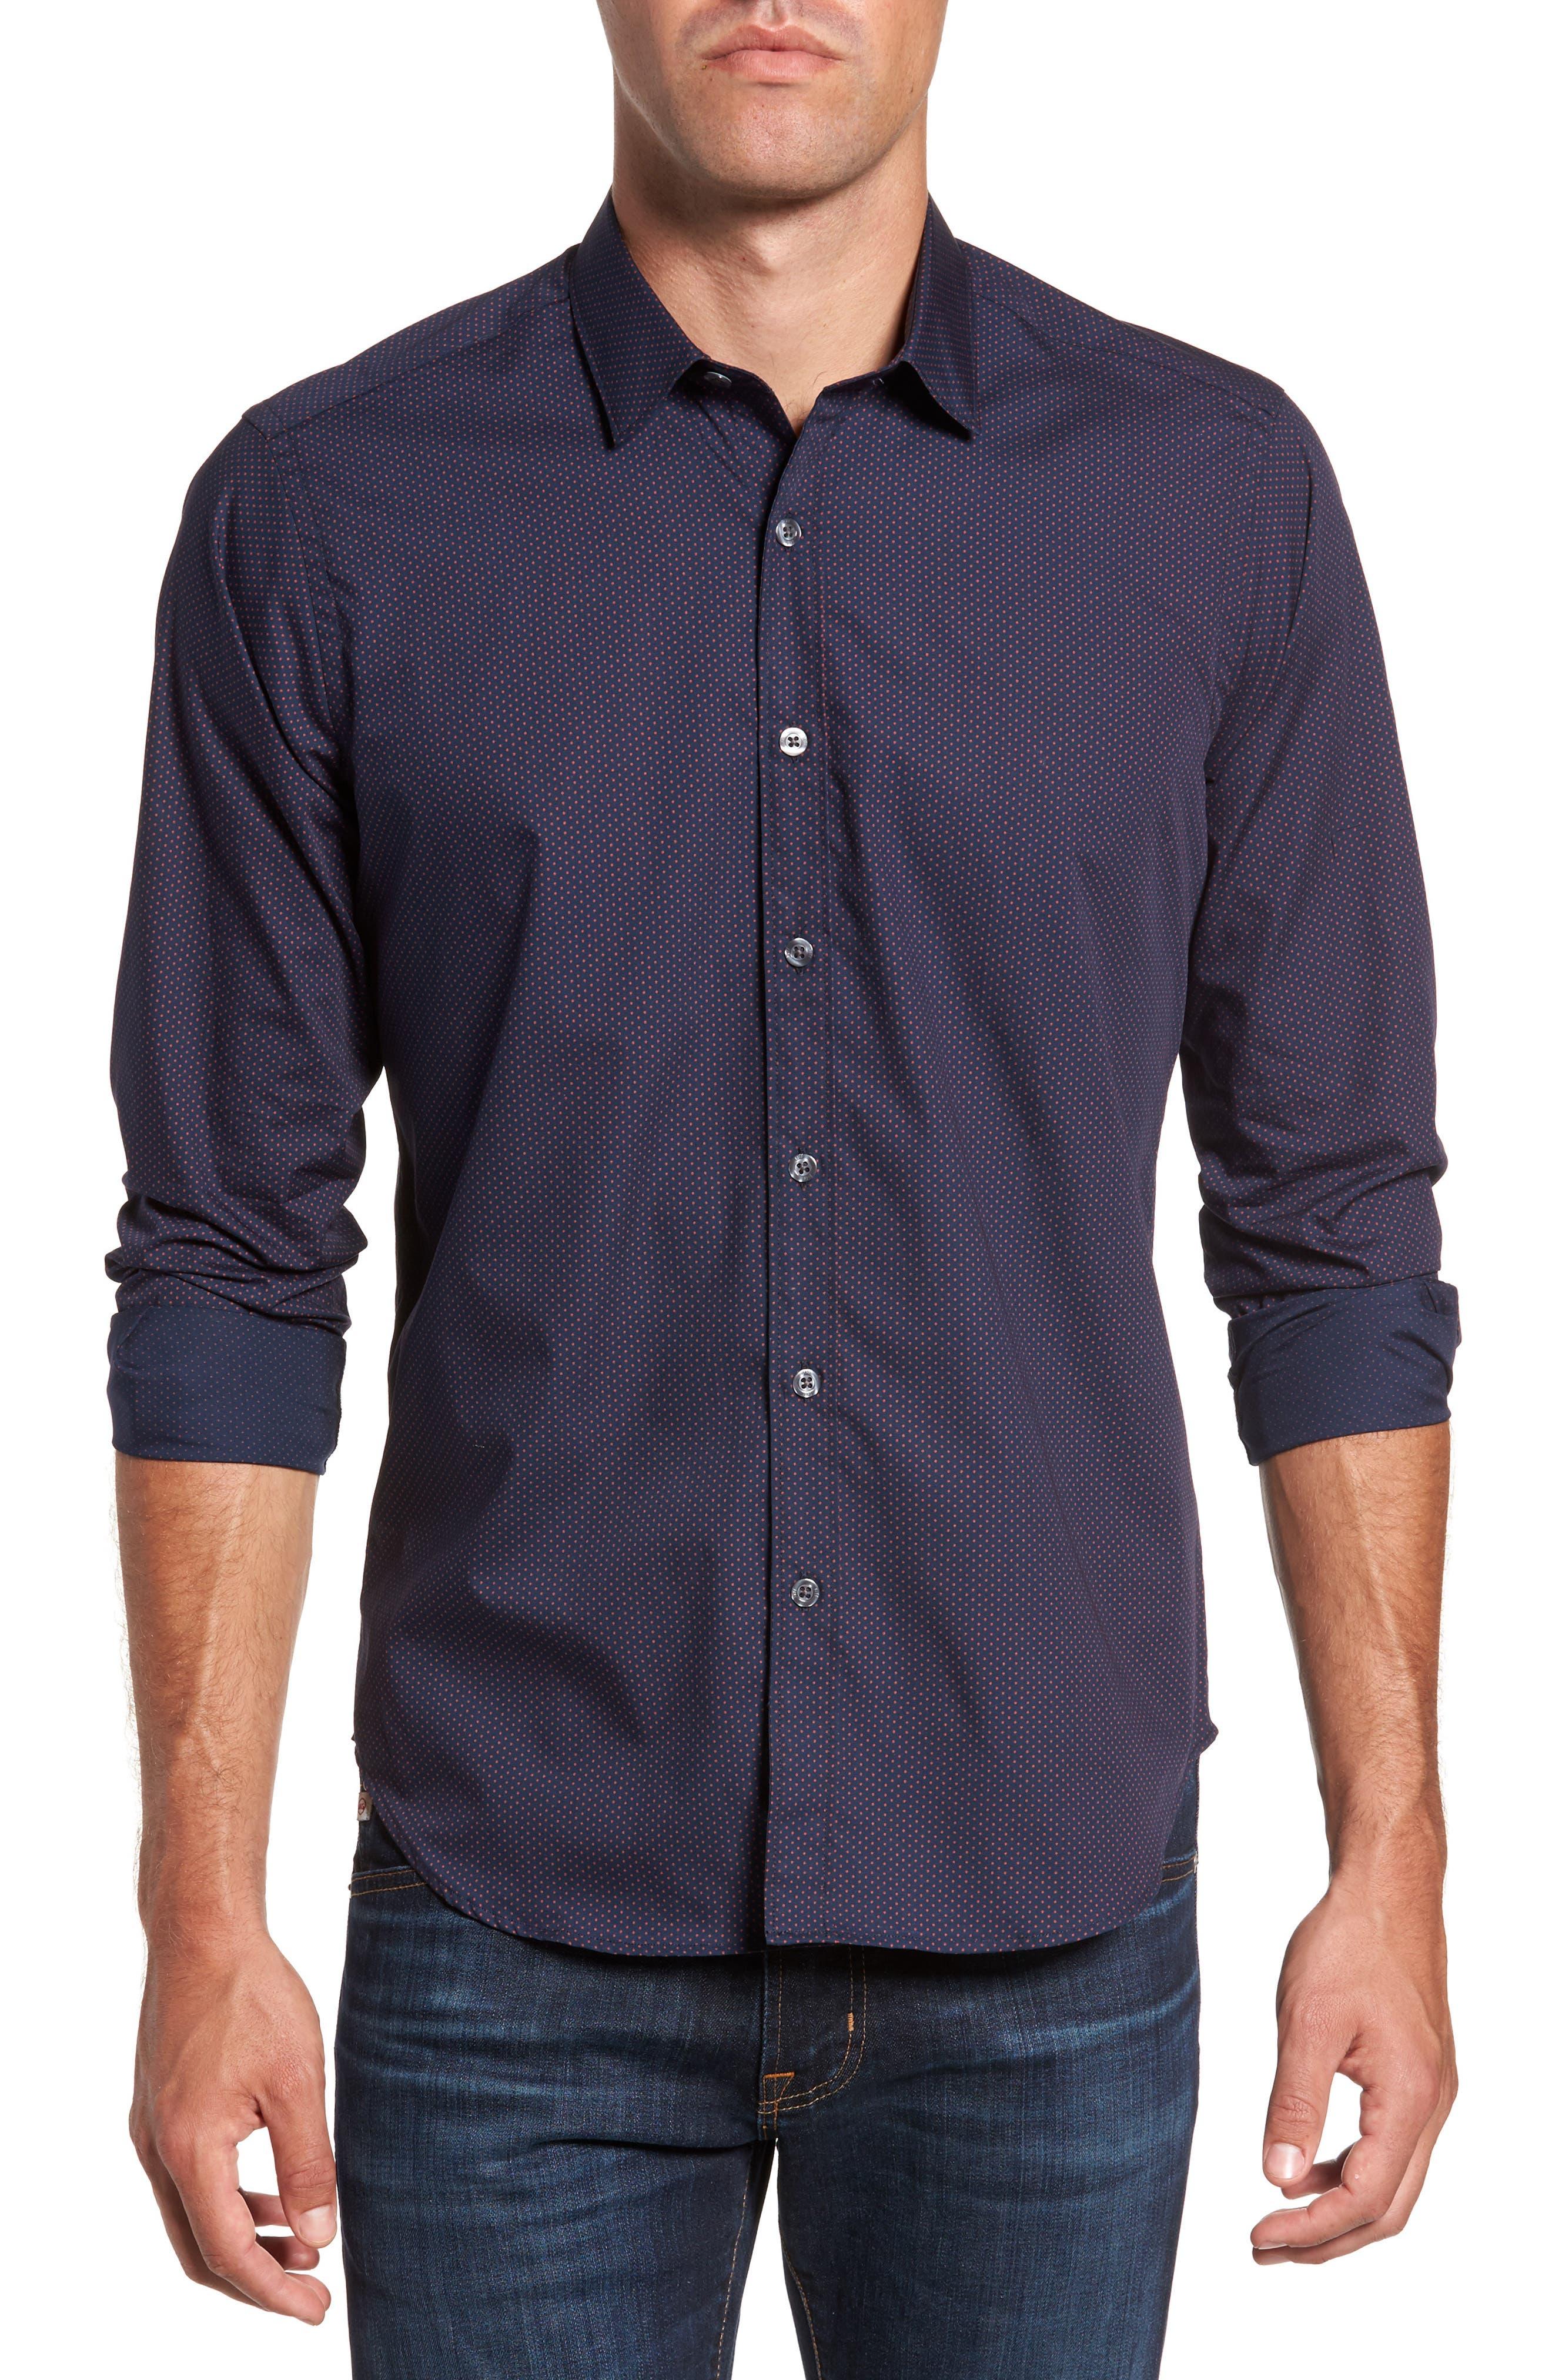 Alternate Image 1 Selected - Jeff Arlington Slim Fit Print Sport Shirt